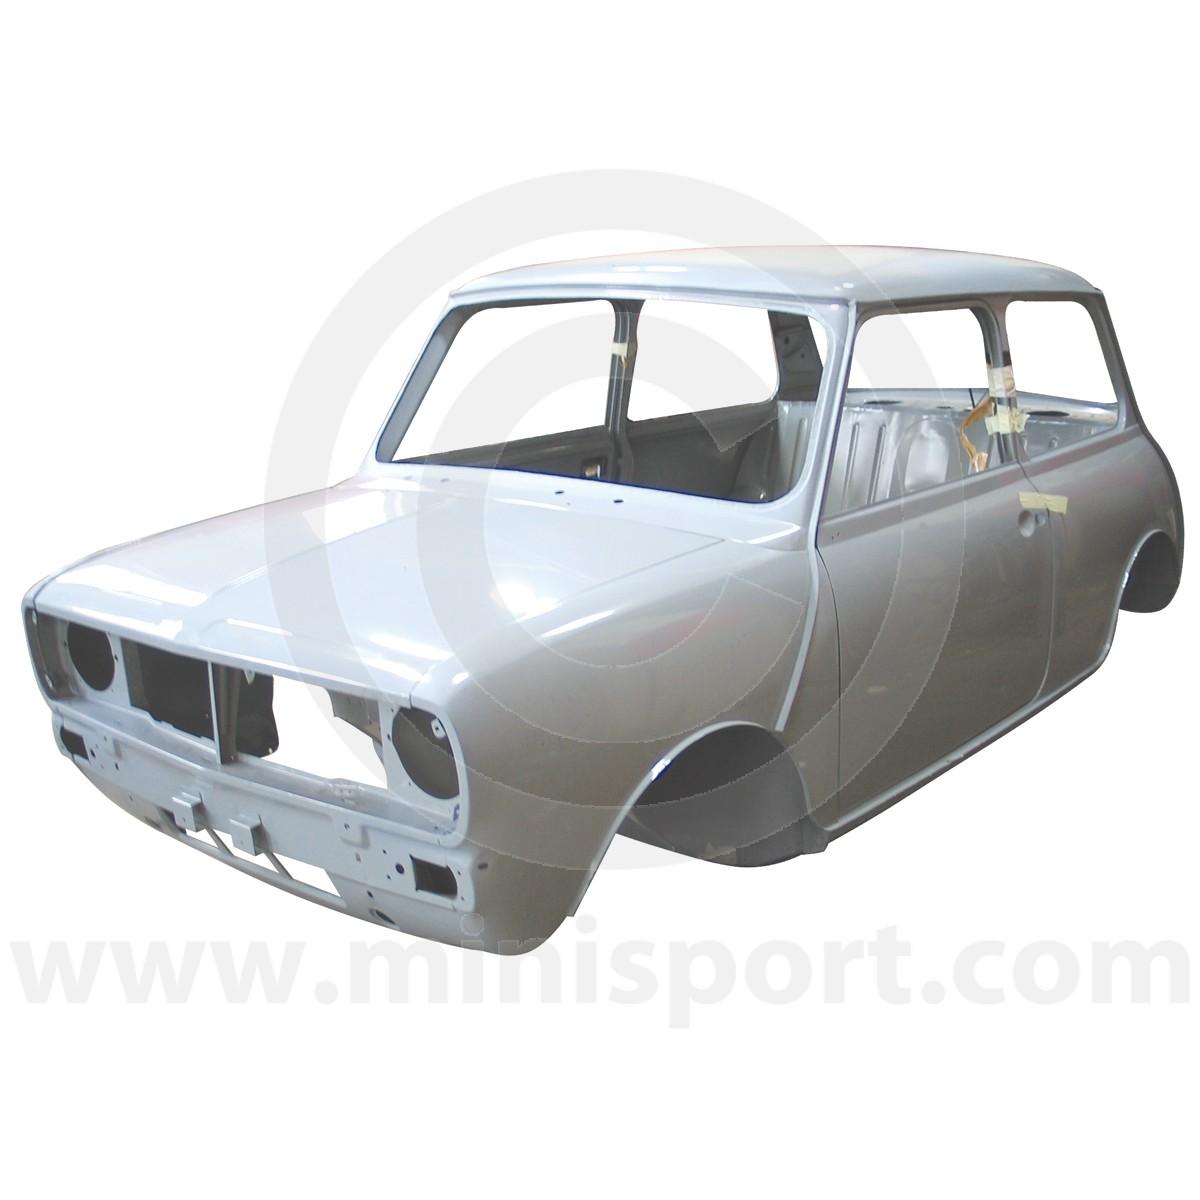 Czh594 Mini Clubman 1275gt Body Shell Body Panels Minisport